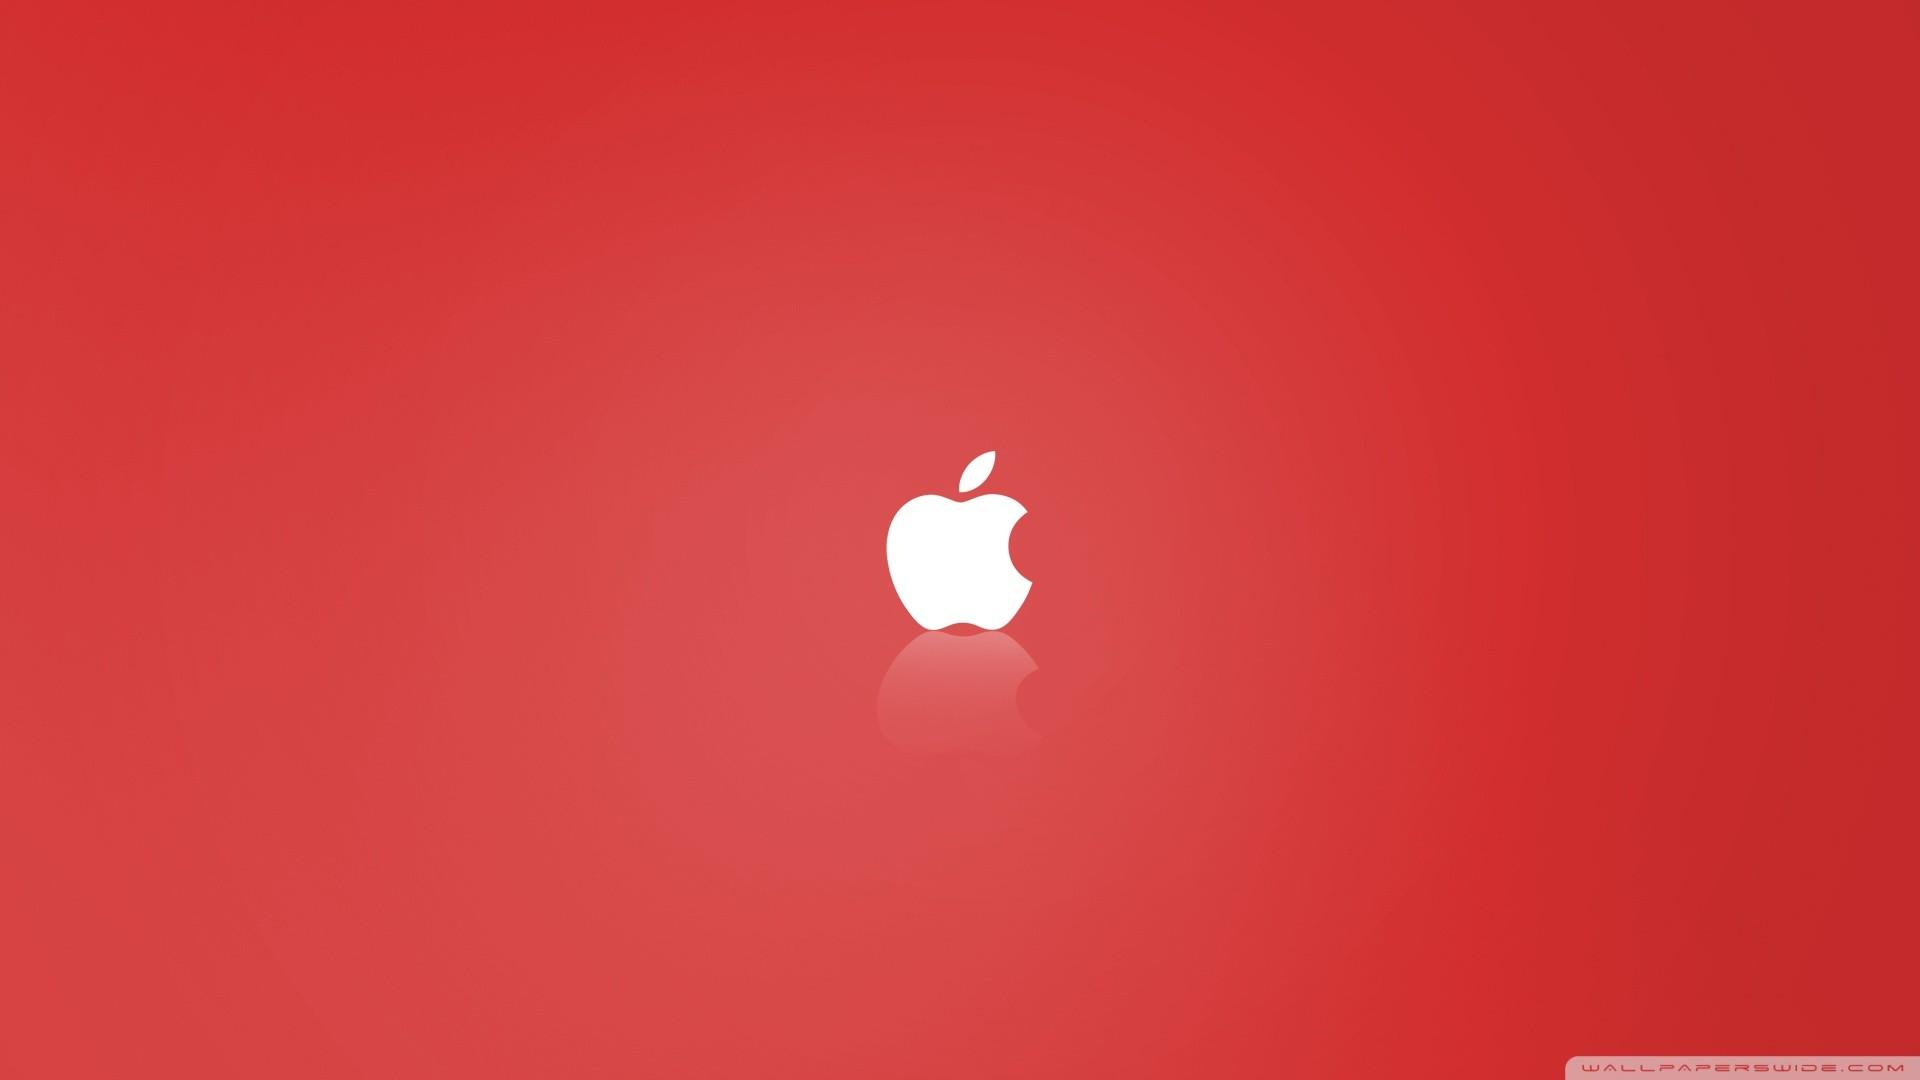 Mac HD Wallpaper 1080p 1